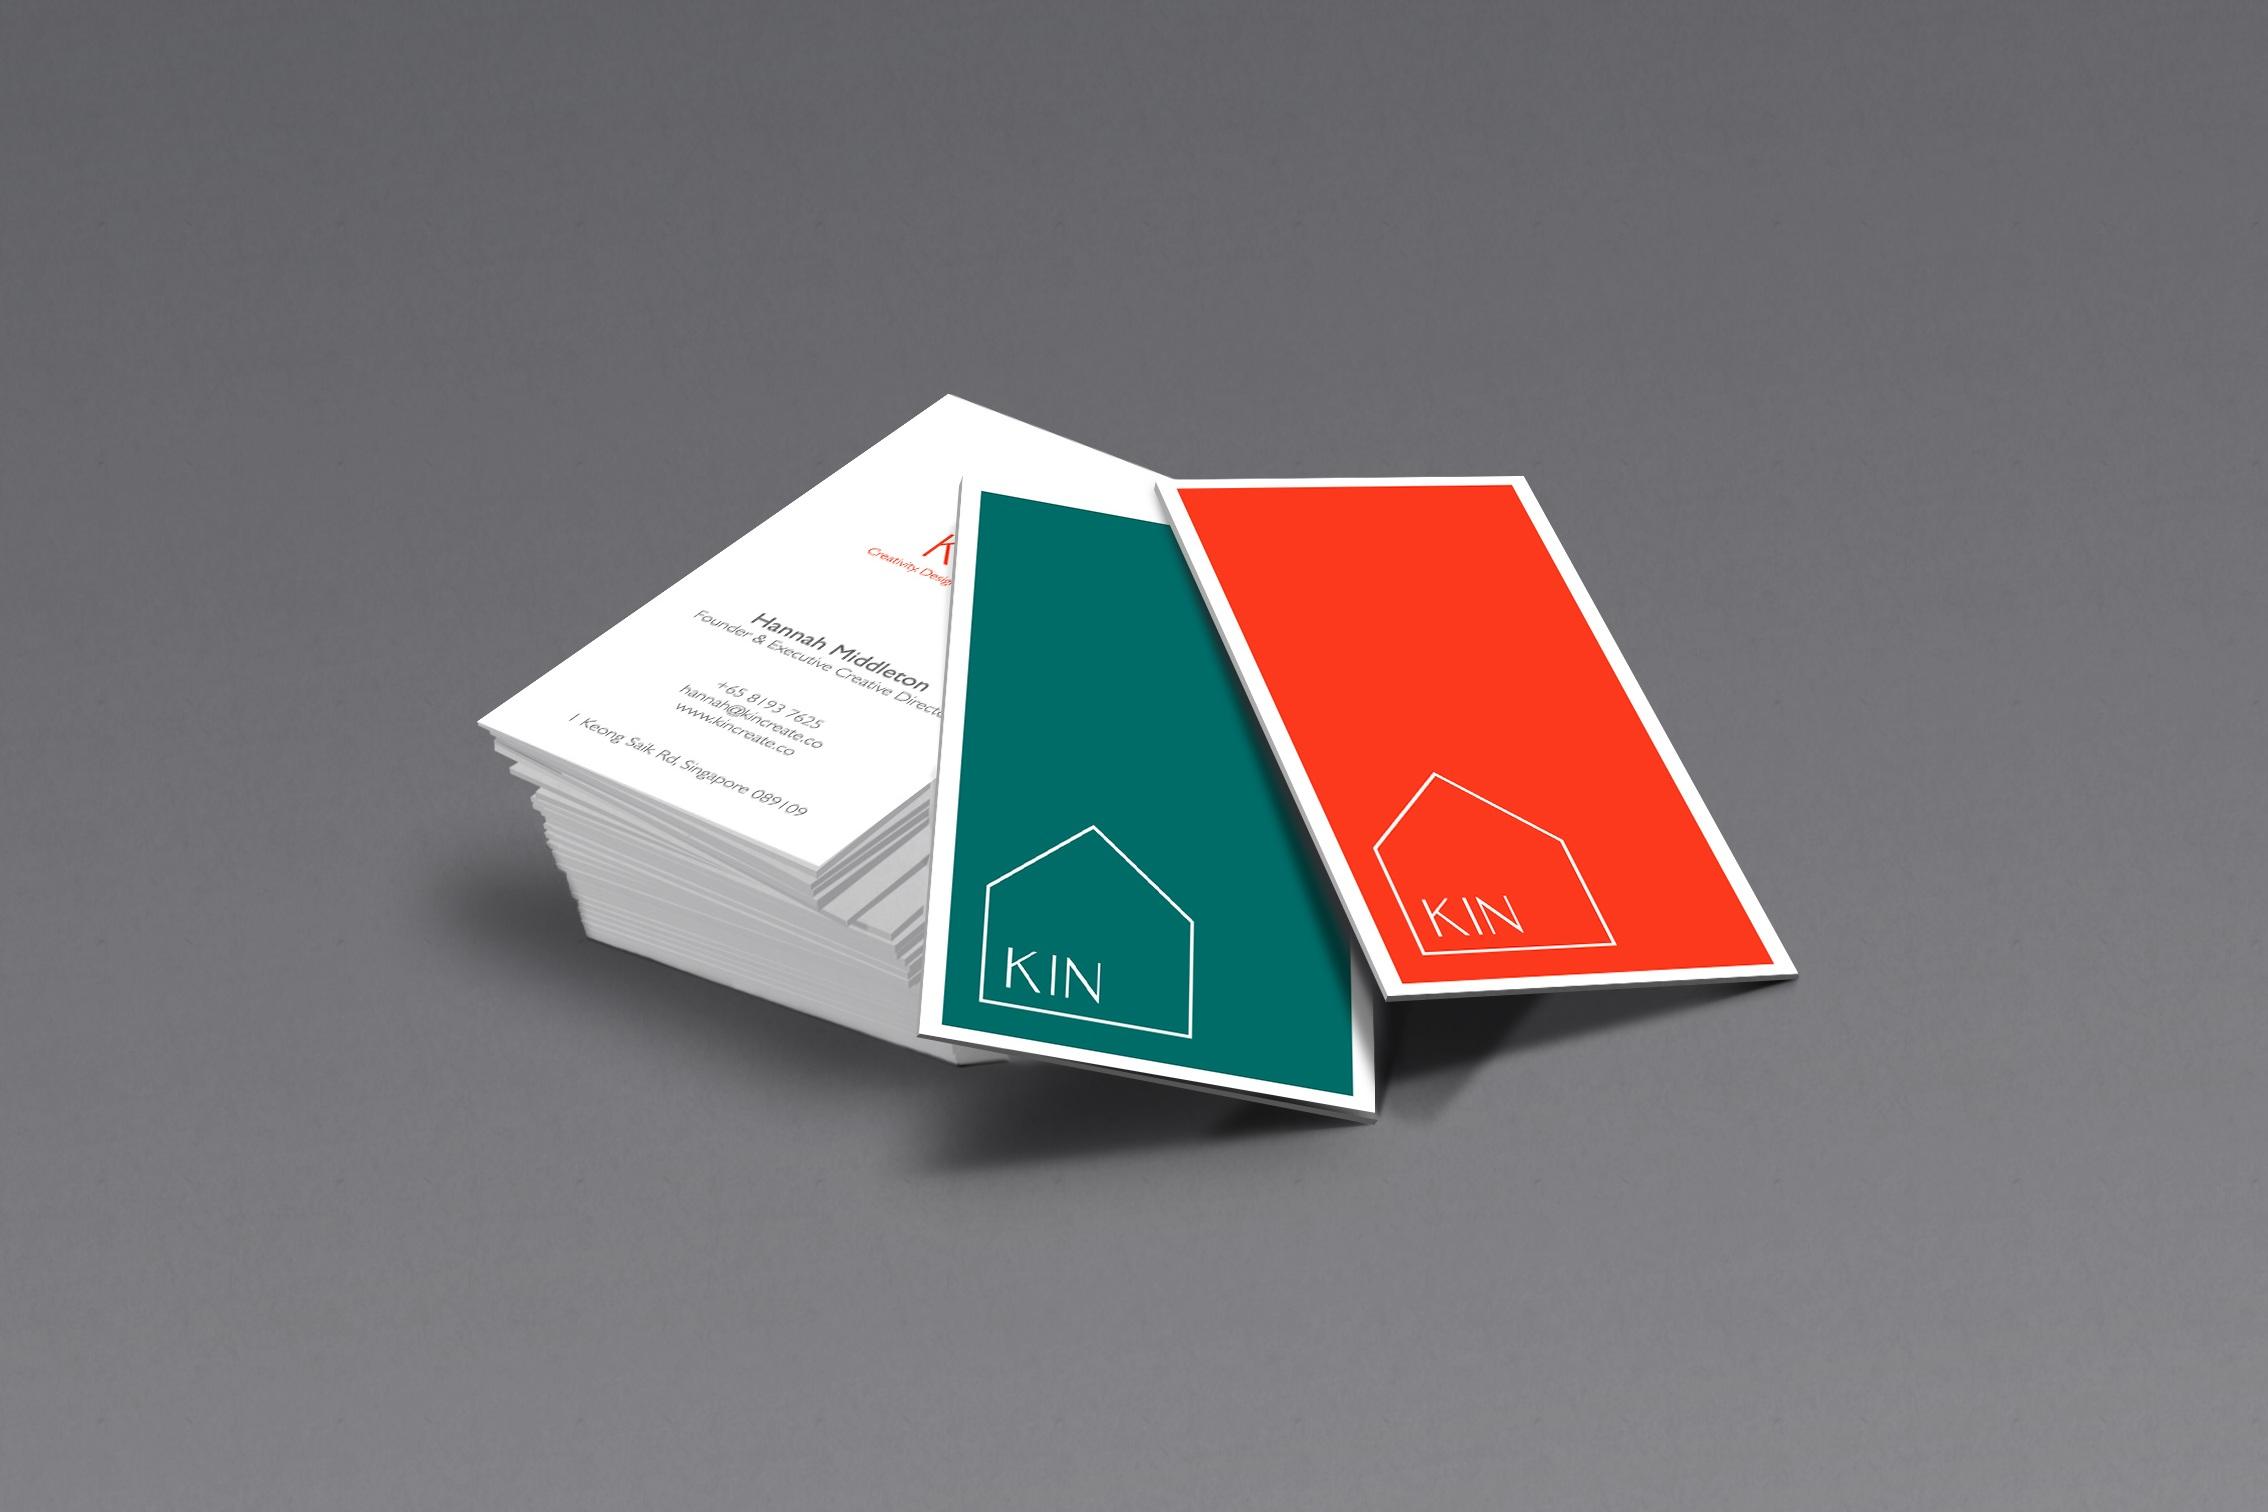 kin+business+card.jpg